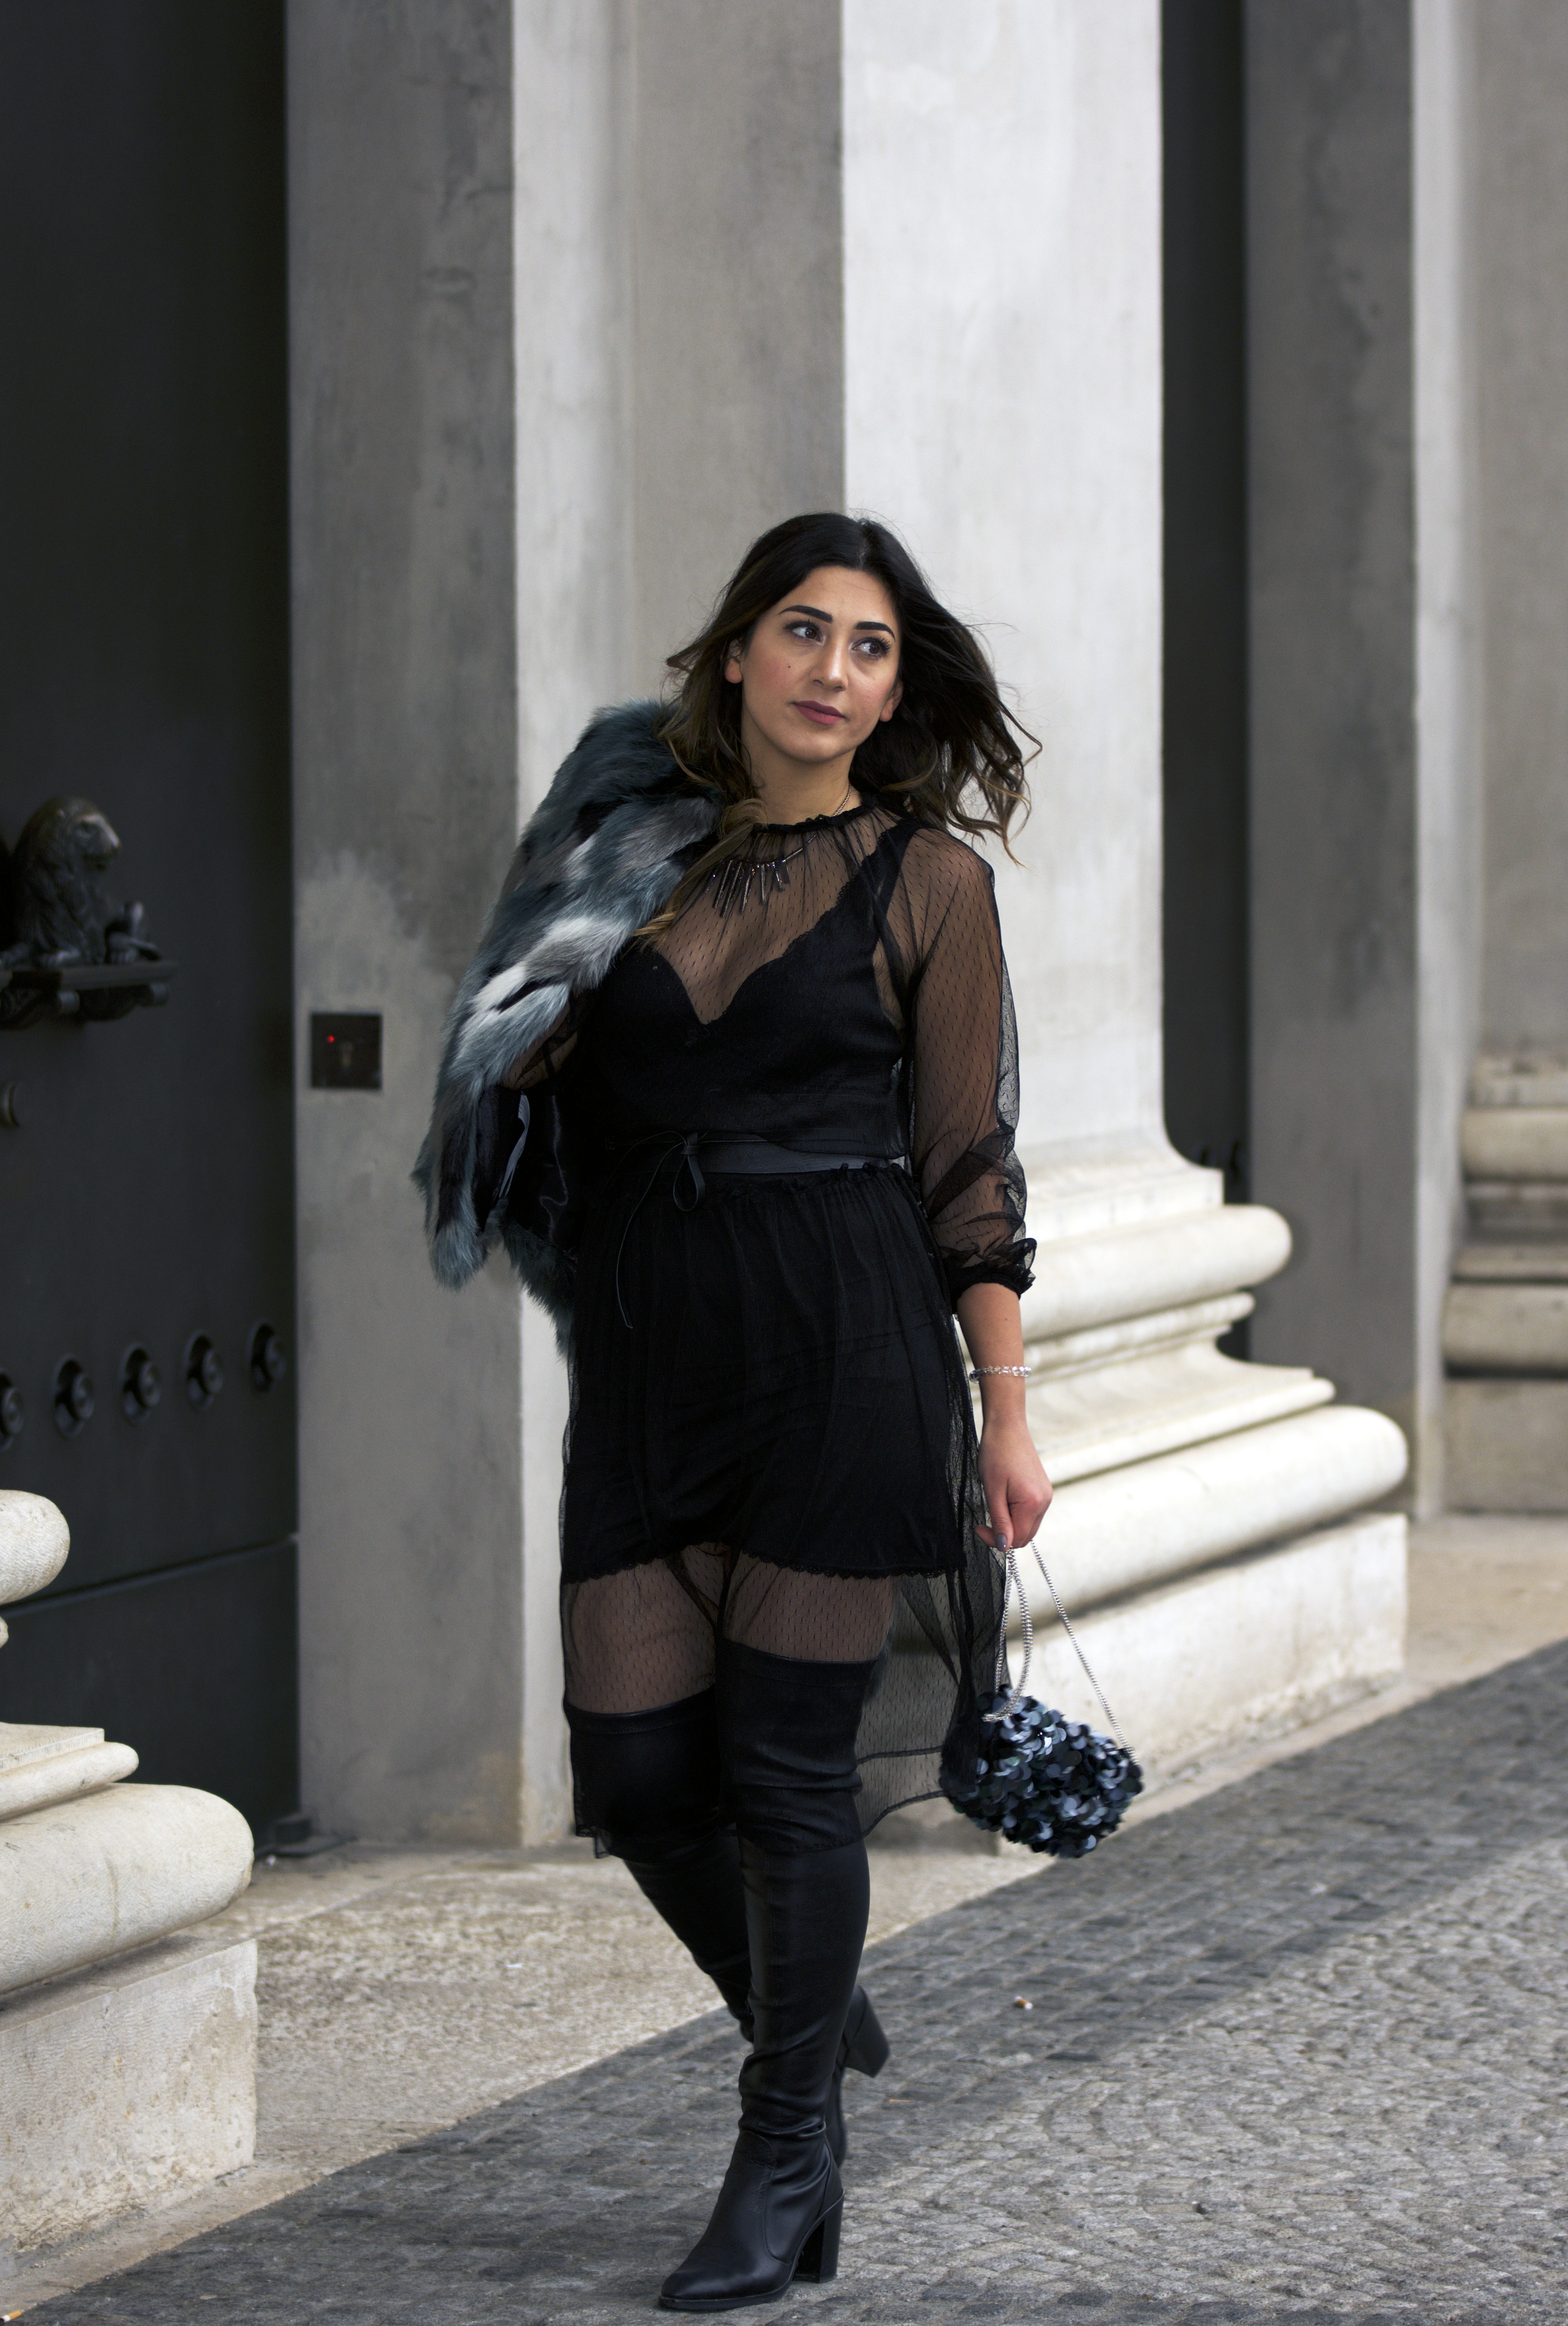 Fashion Blogger Netzstoffkleid Outfit